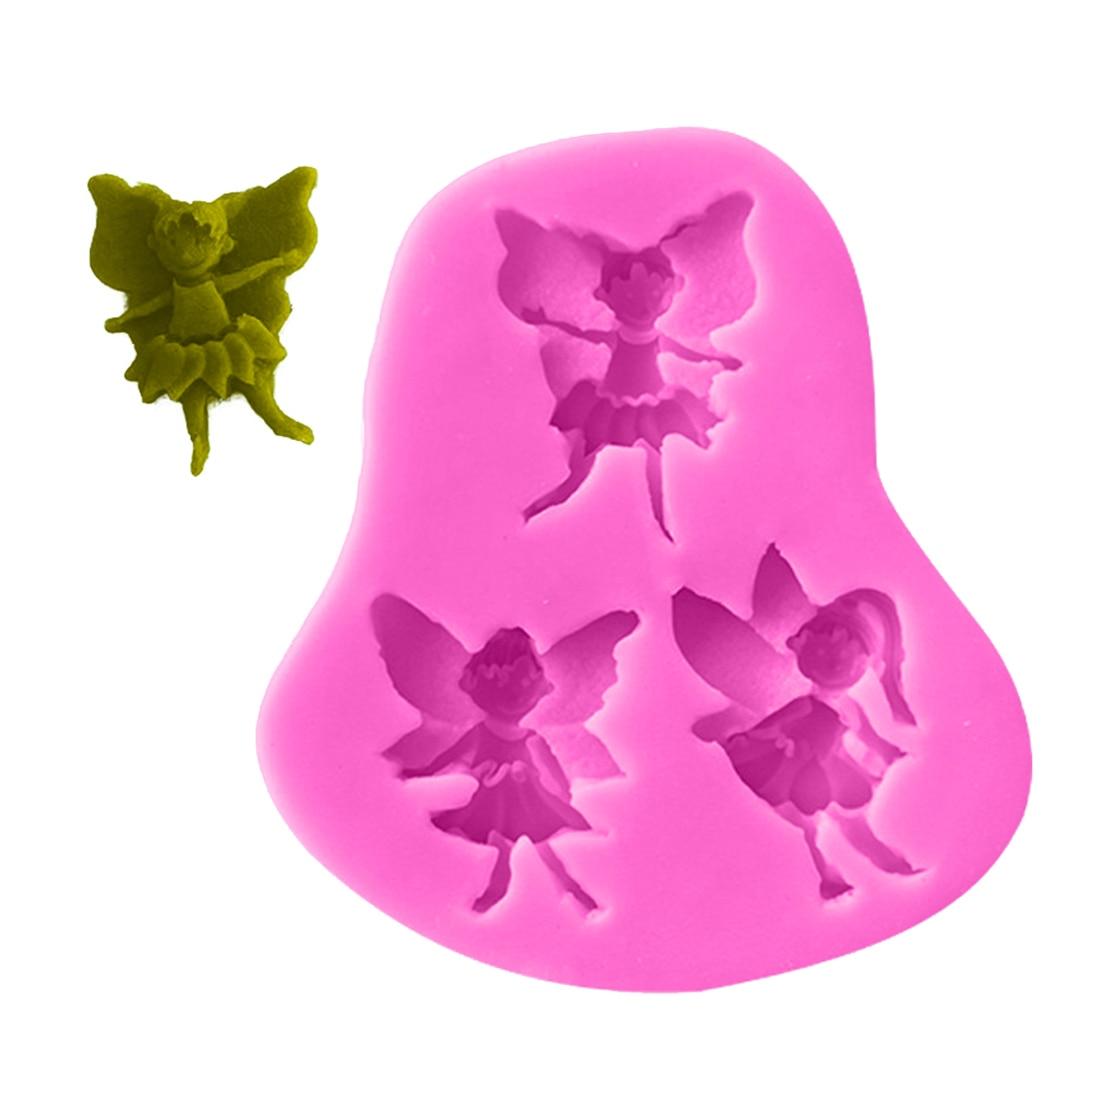 1 pieza de utensilios de cocina de silicona con forma de Hada de elfo 3D, molde de Chocolate, utensilios de cocina de decoración, molde de silicona para repostería, molde de silicona